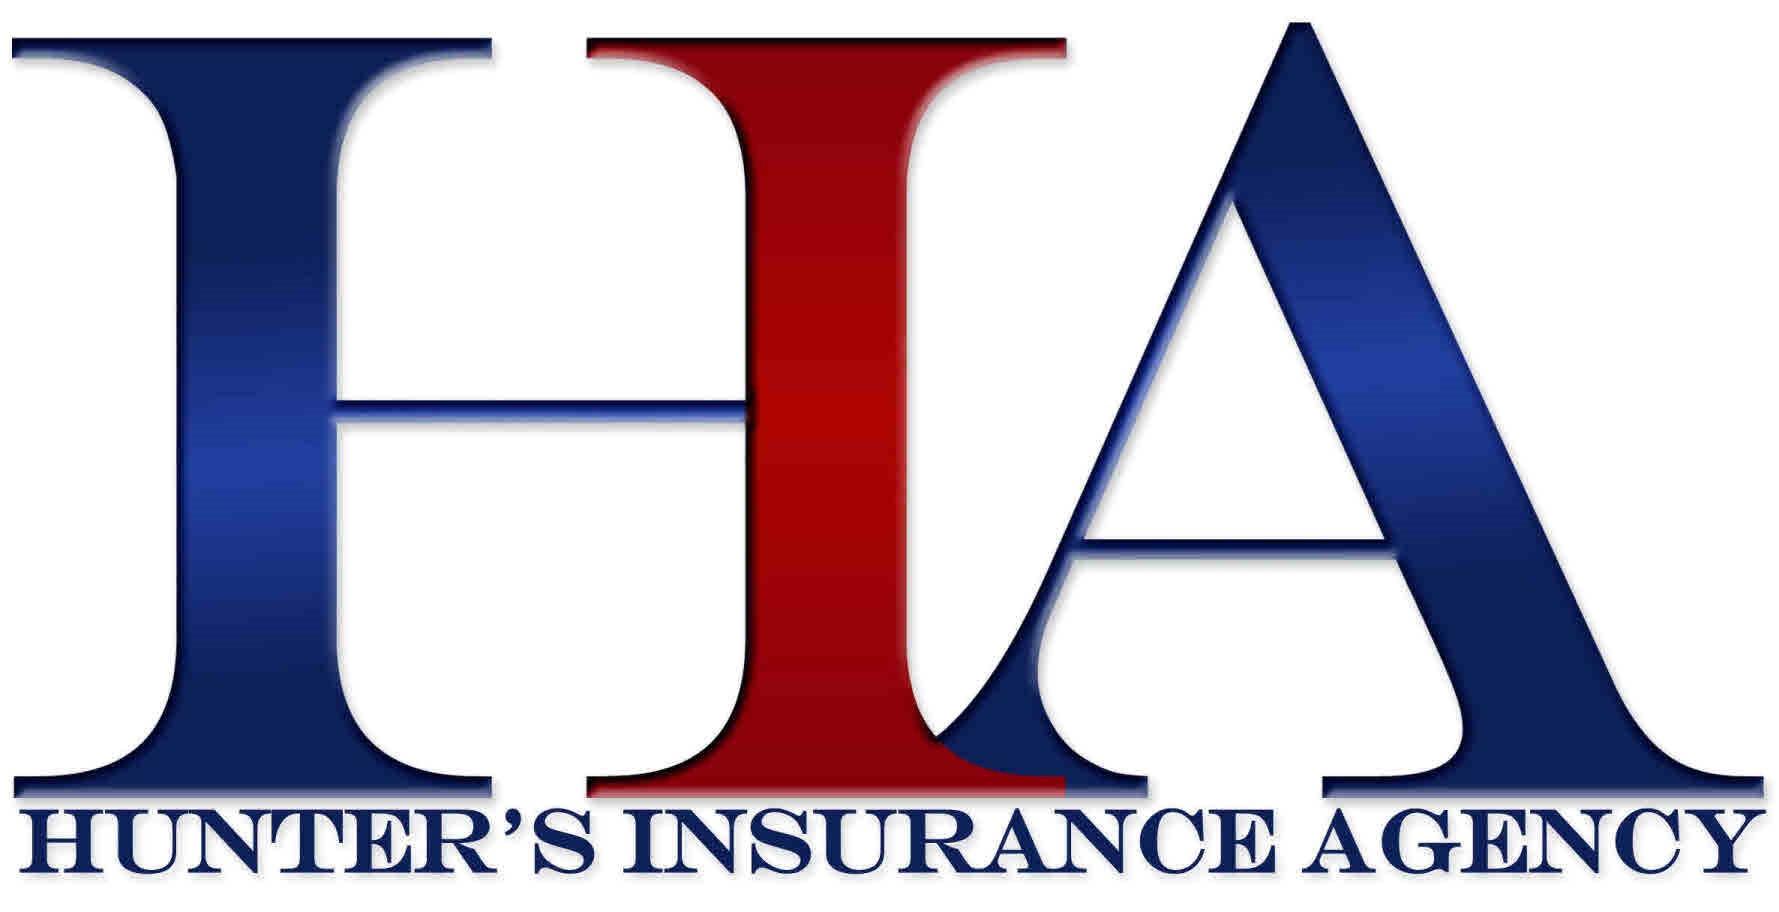 Huntersinsuranceagency